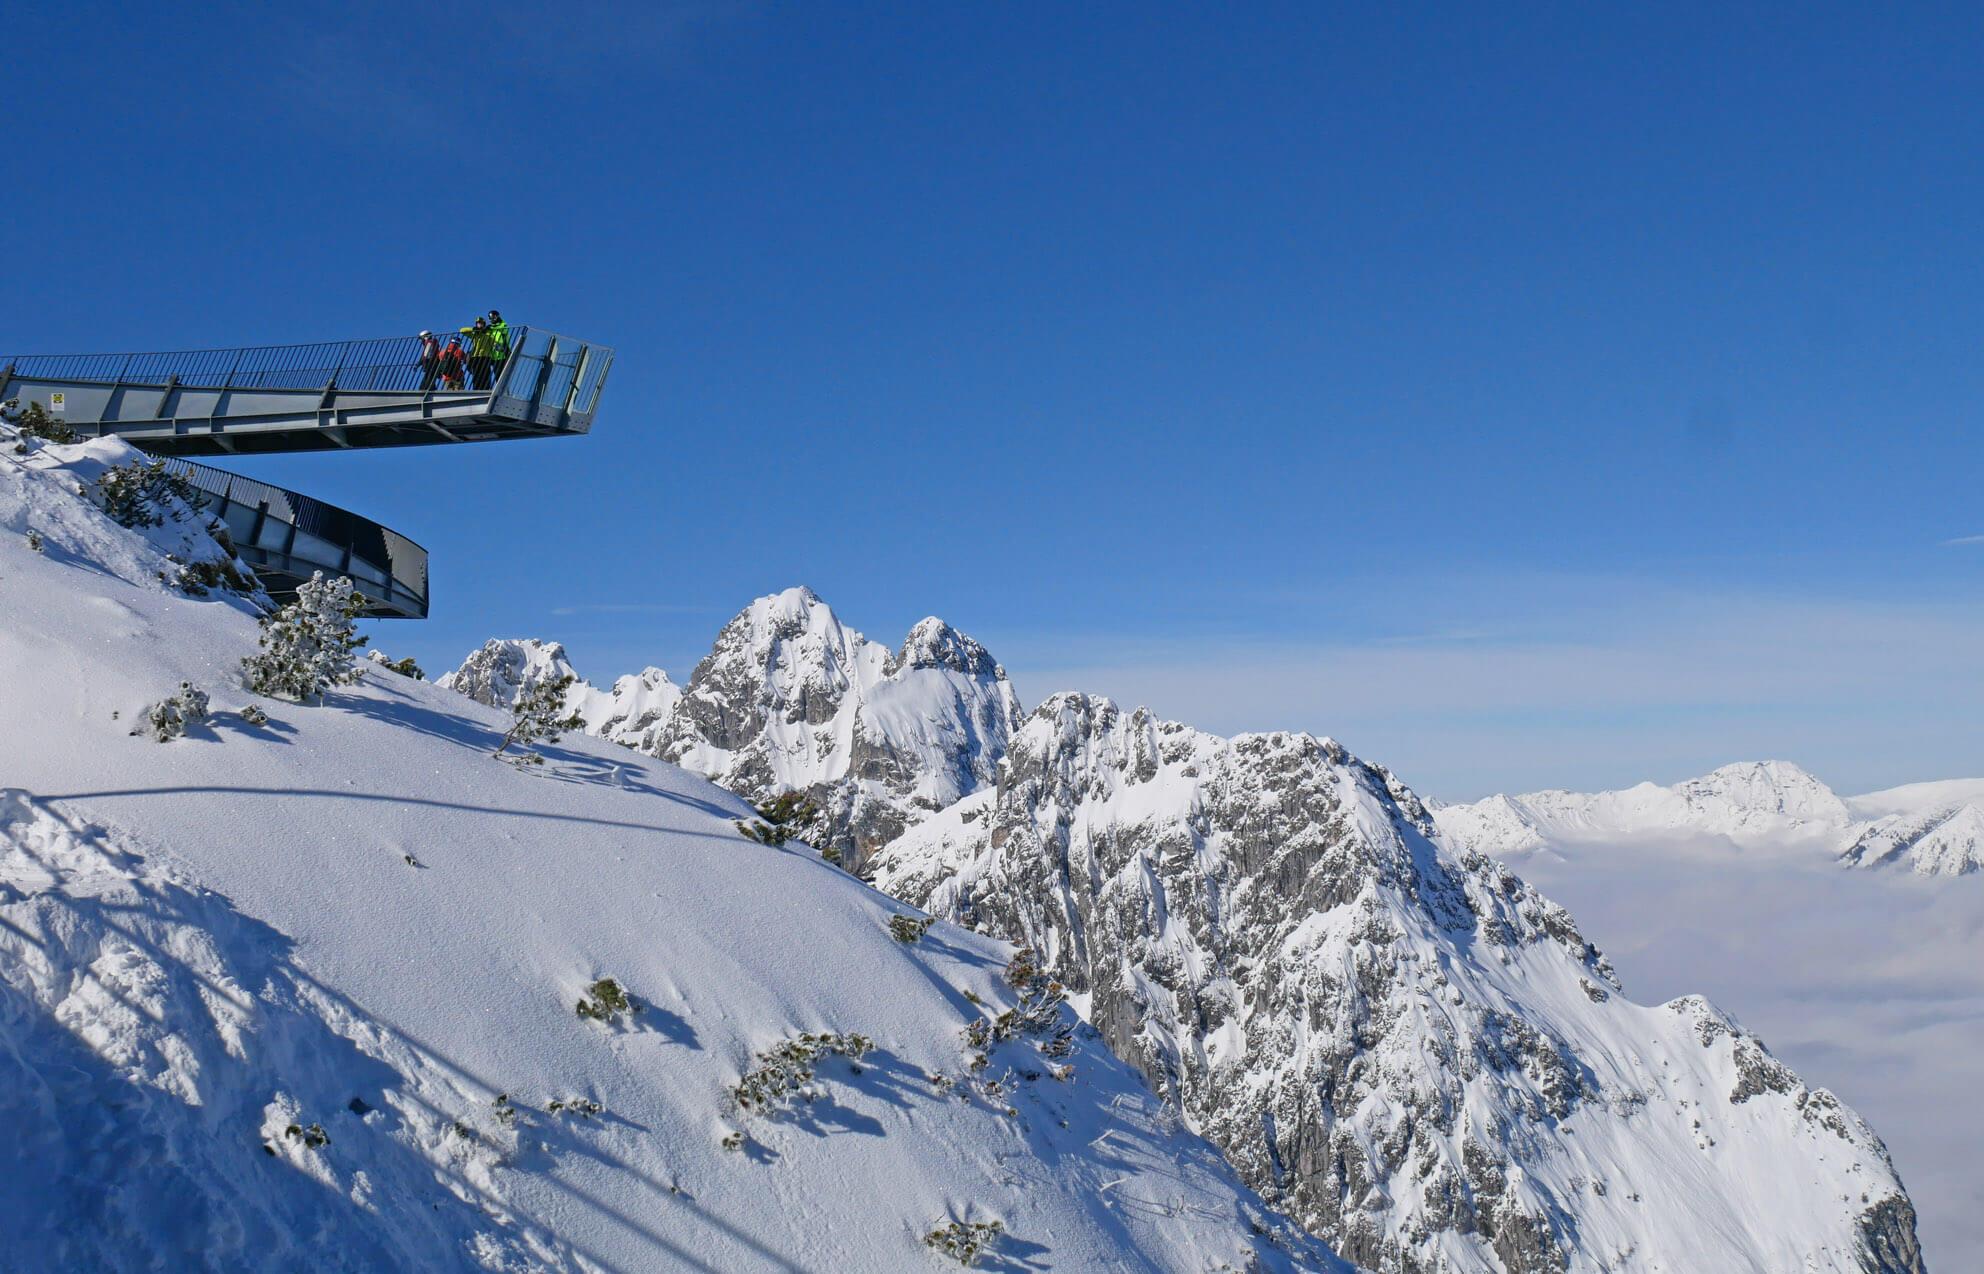 Alpspix Wintertag